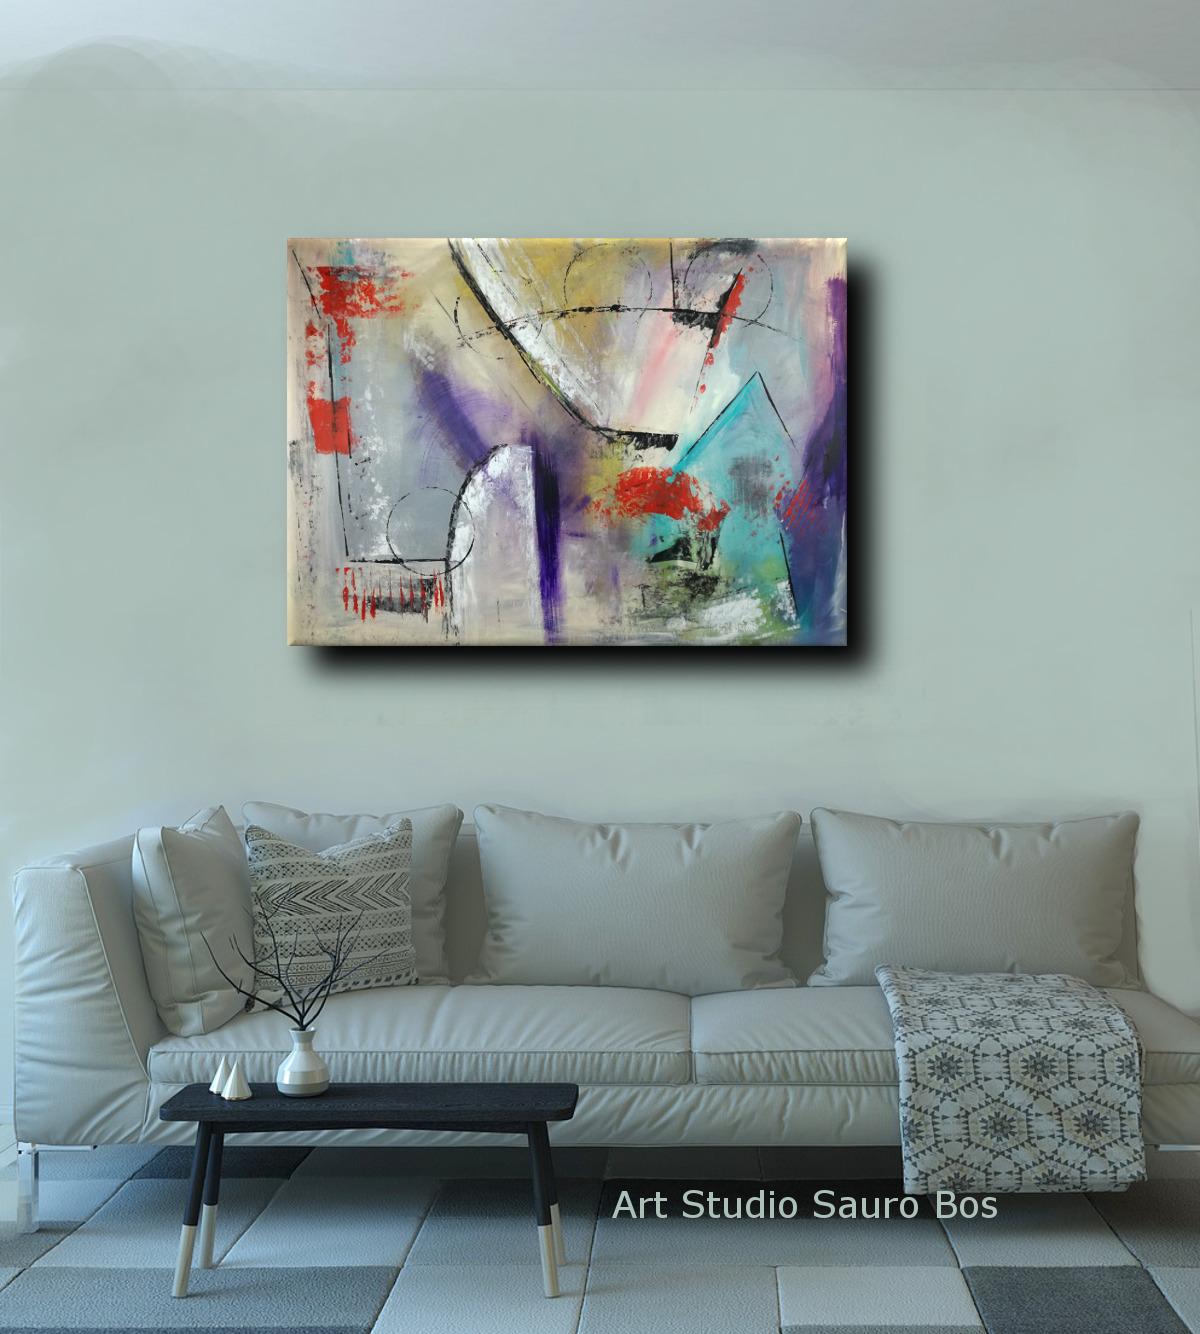 Emejing quadri moderni per arredamento images home - Quadri arredamento casa ...